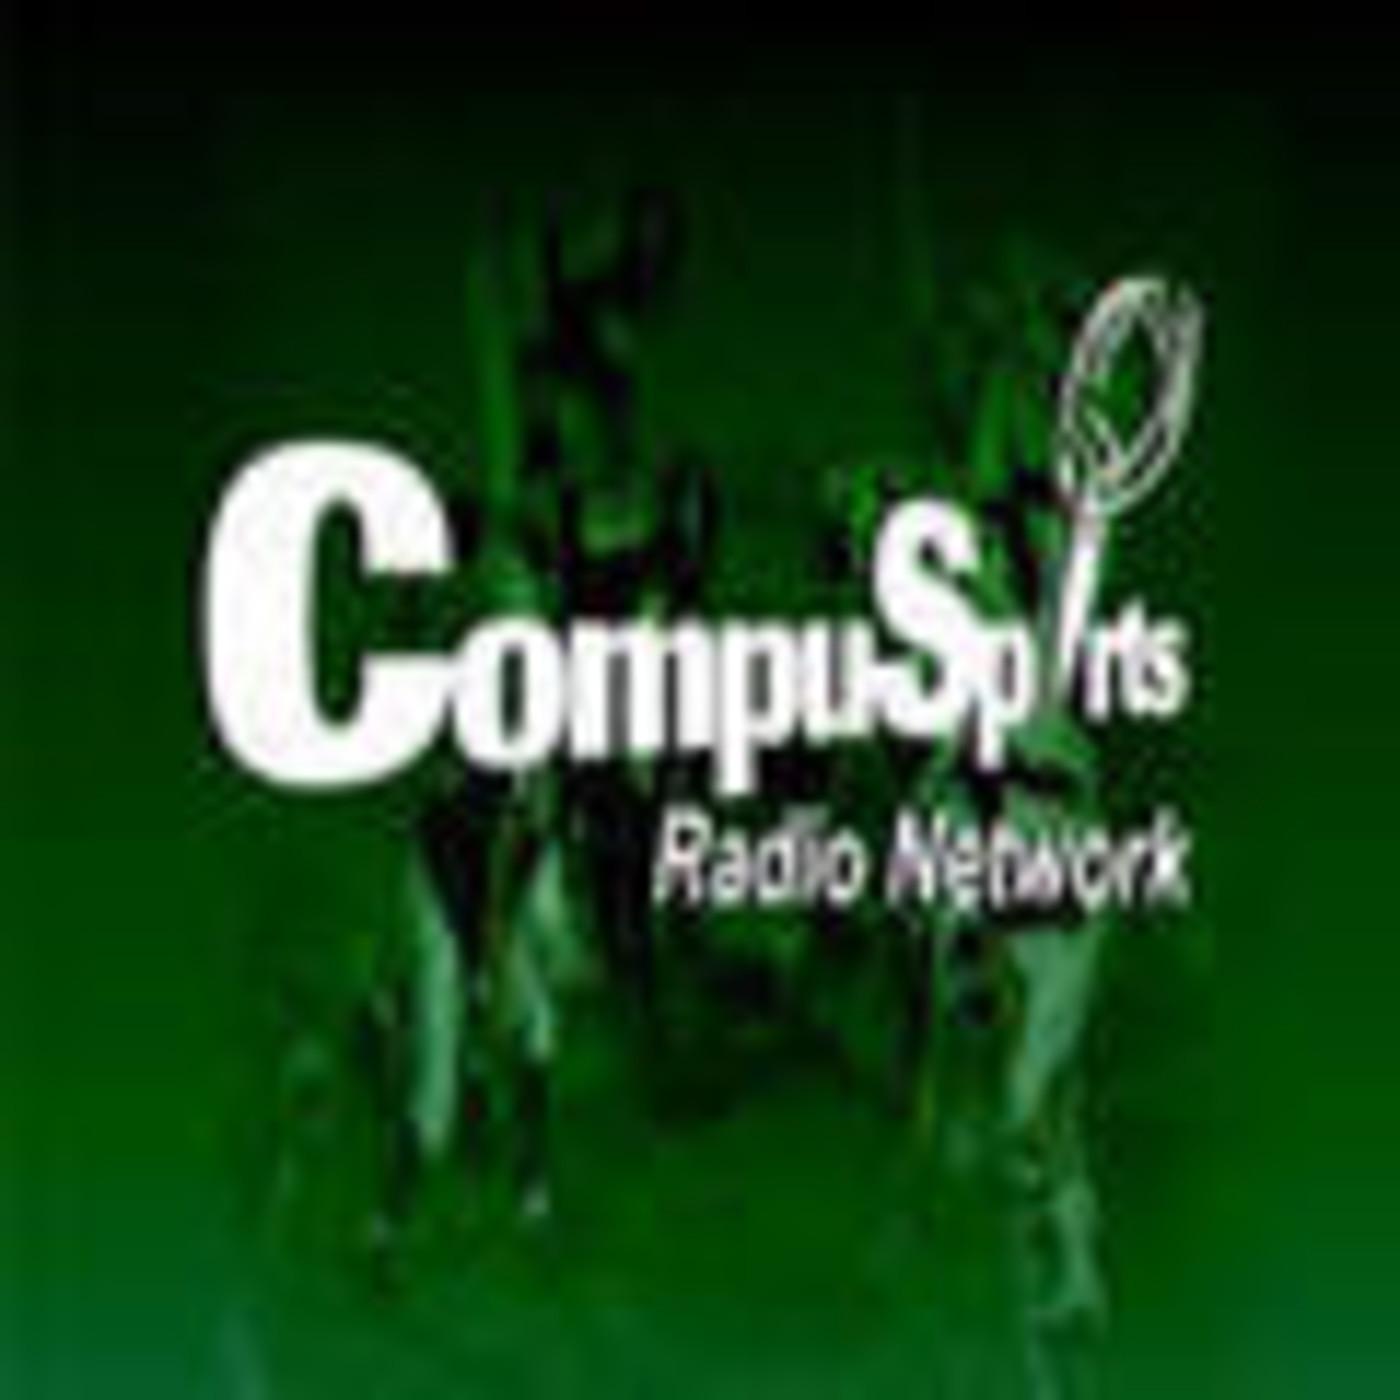 CompuSports Radio Network